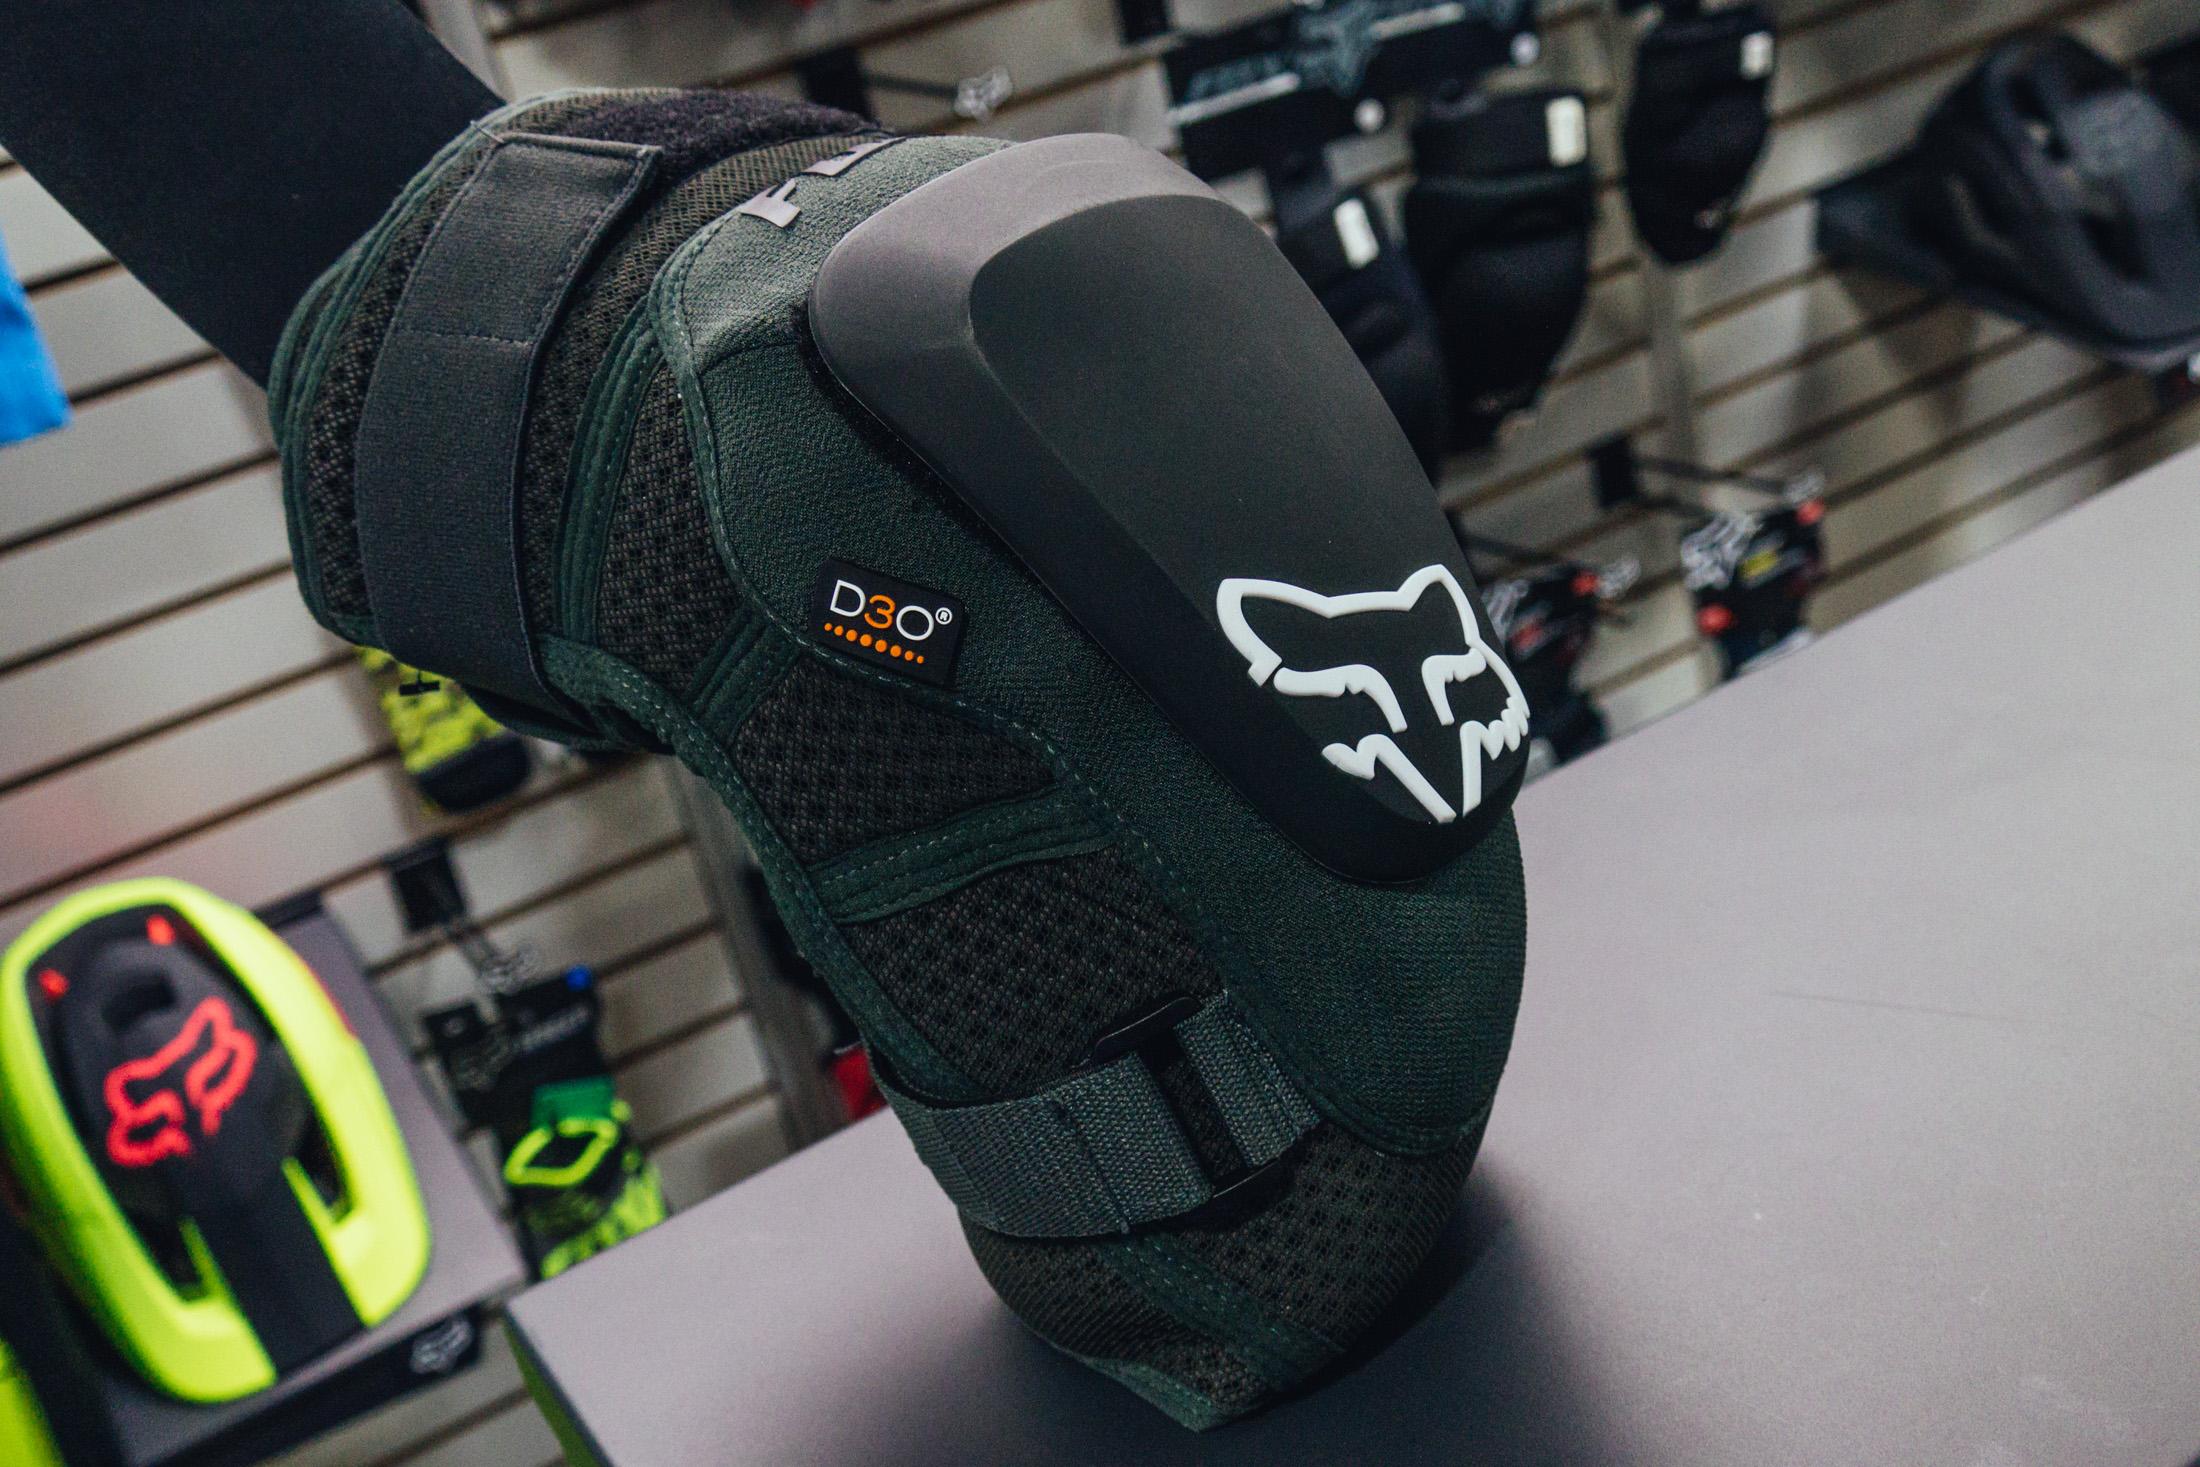 Drag Racing Helmets >> Fox Racing Launch Pro Knee Pads - INTERBIKE - 2017 Mountain Bike Apparel and Protective Gear ...